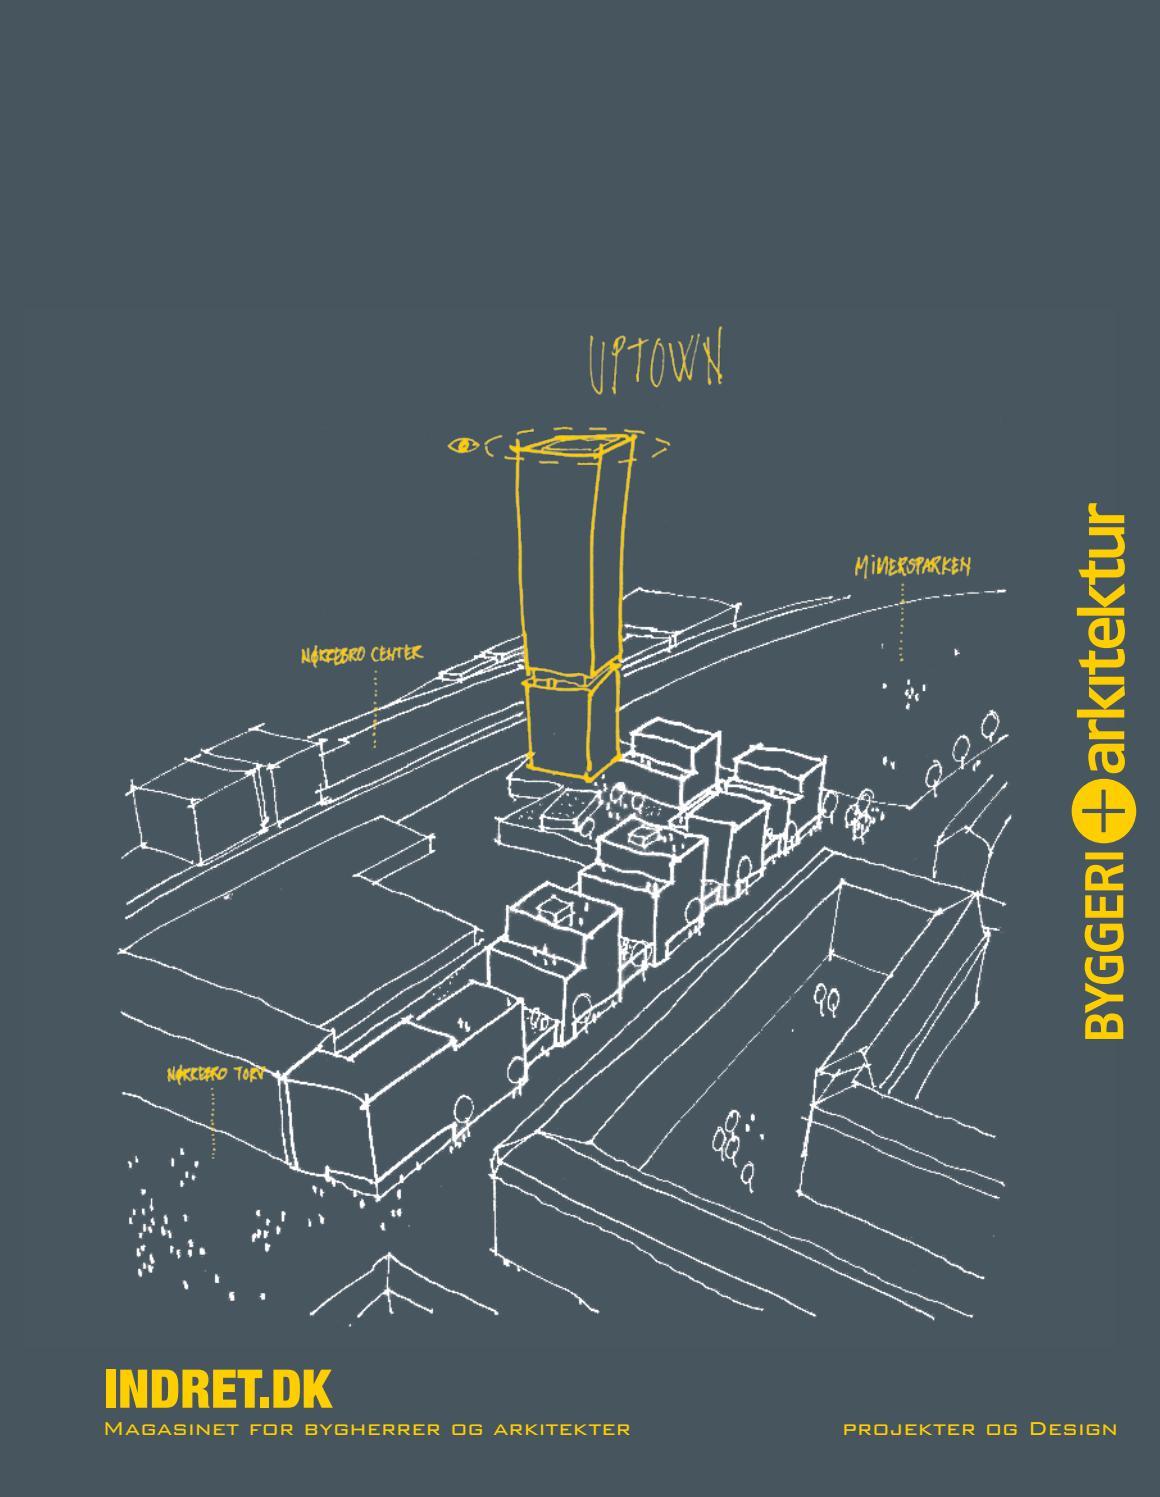 Byggeri arkitetktur nr74 by MediaXpress Interaktiv - issuu